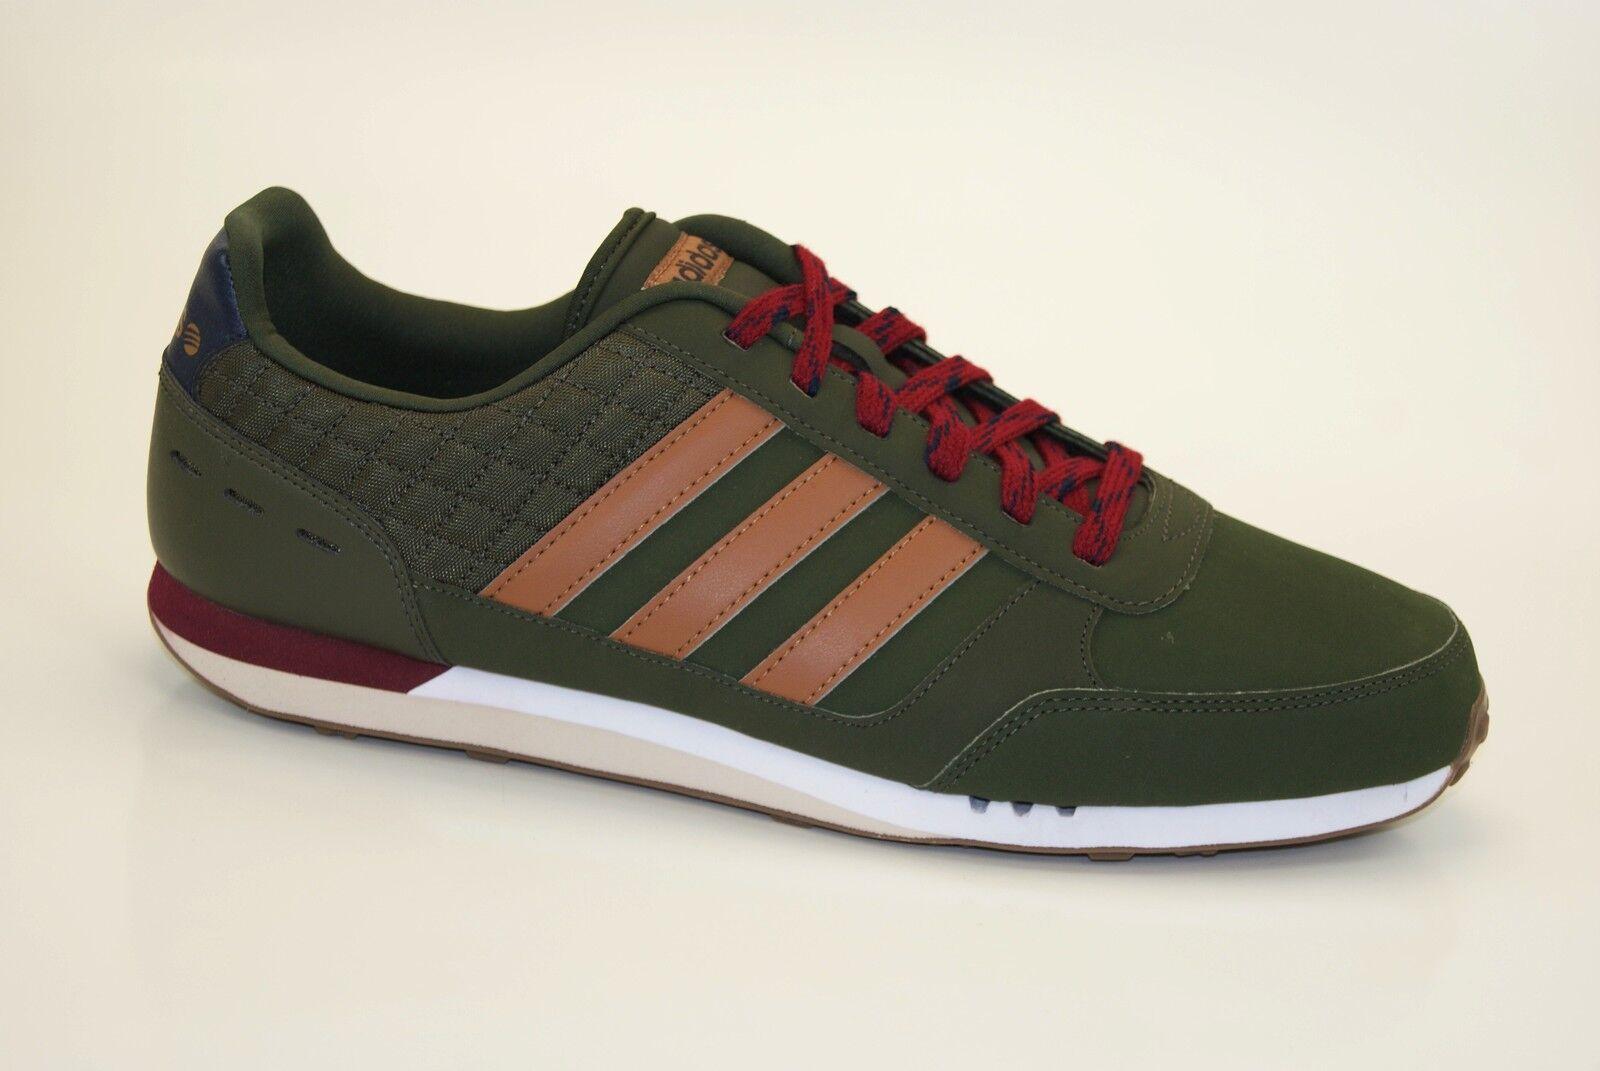 Adidas City Racer Sneakers Sportschuhe Turnschuhe Training Damen Herren Schuhe